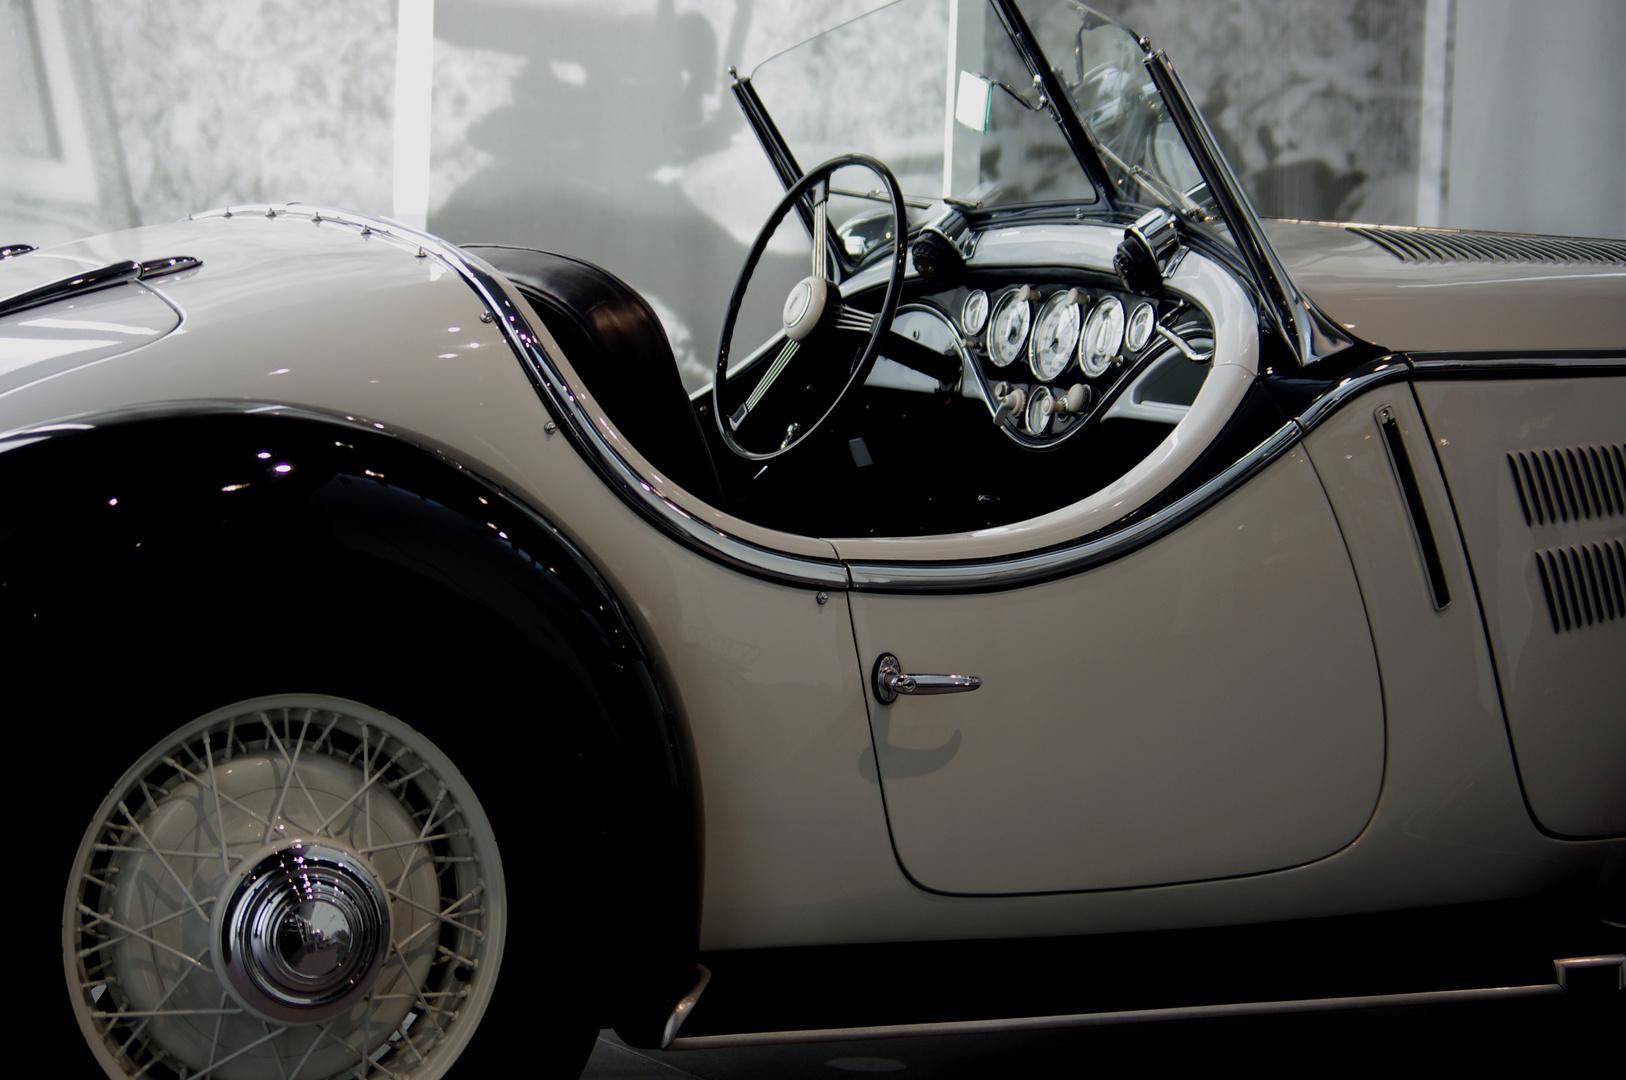 Audi Wanderer Foto Bild Autos Zweirader Oldtimer Youngtimer